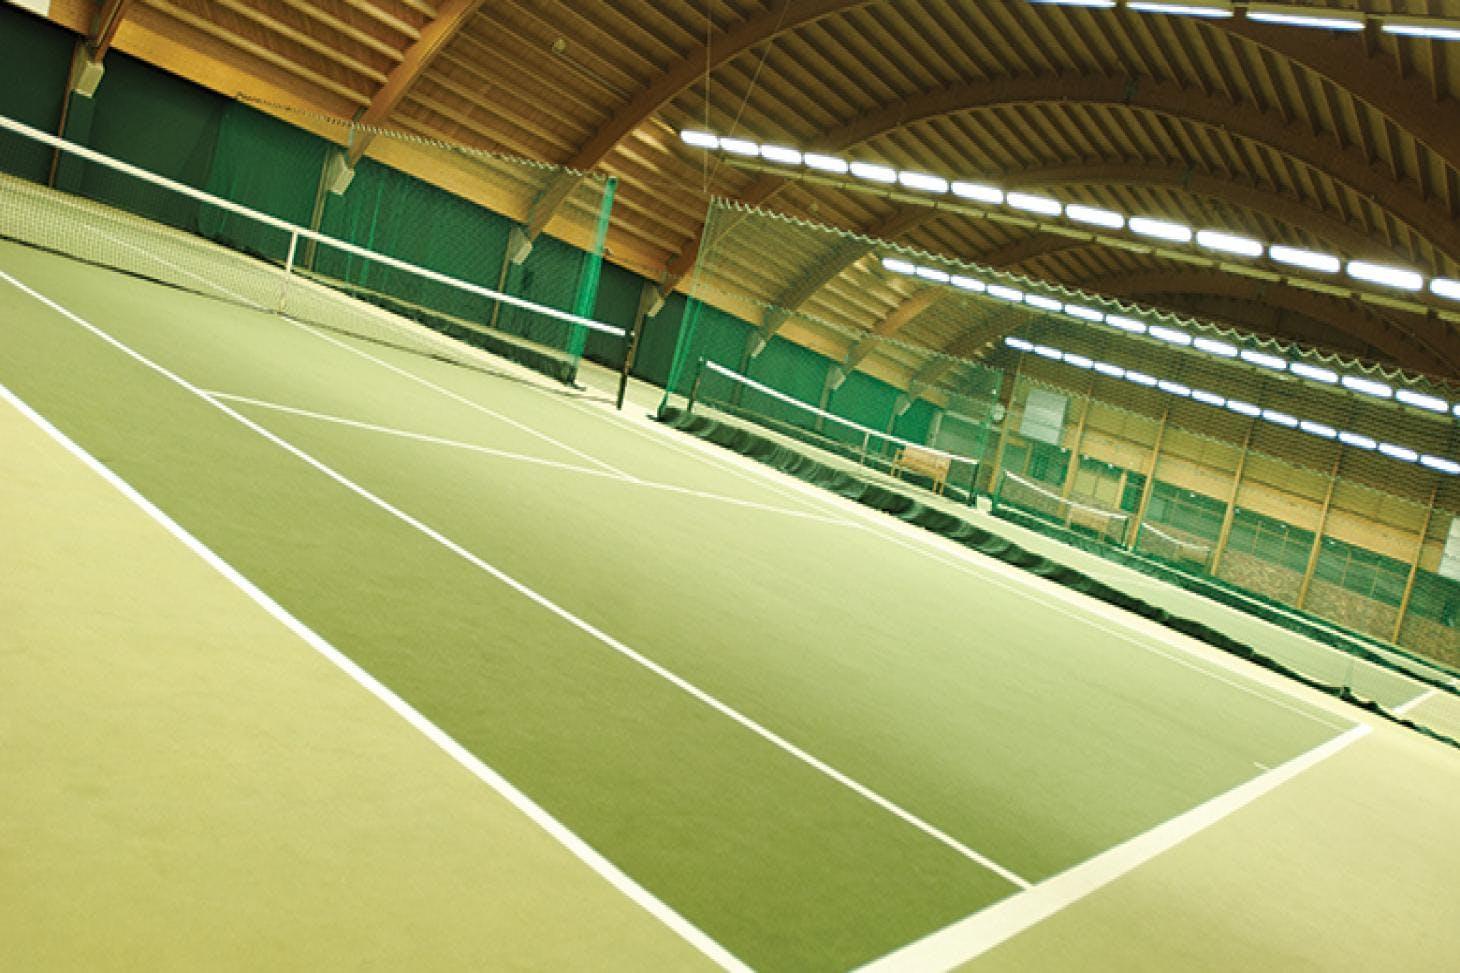 David Lloyd Heston Indoor tennis court